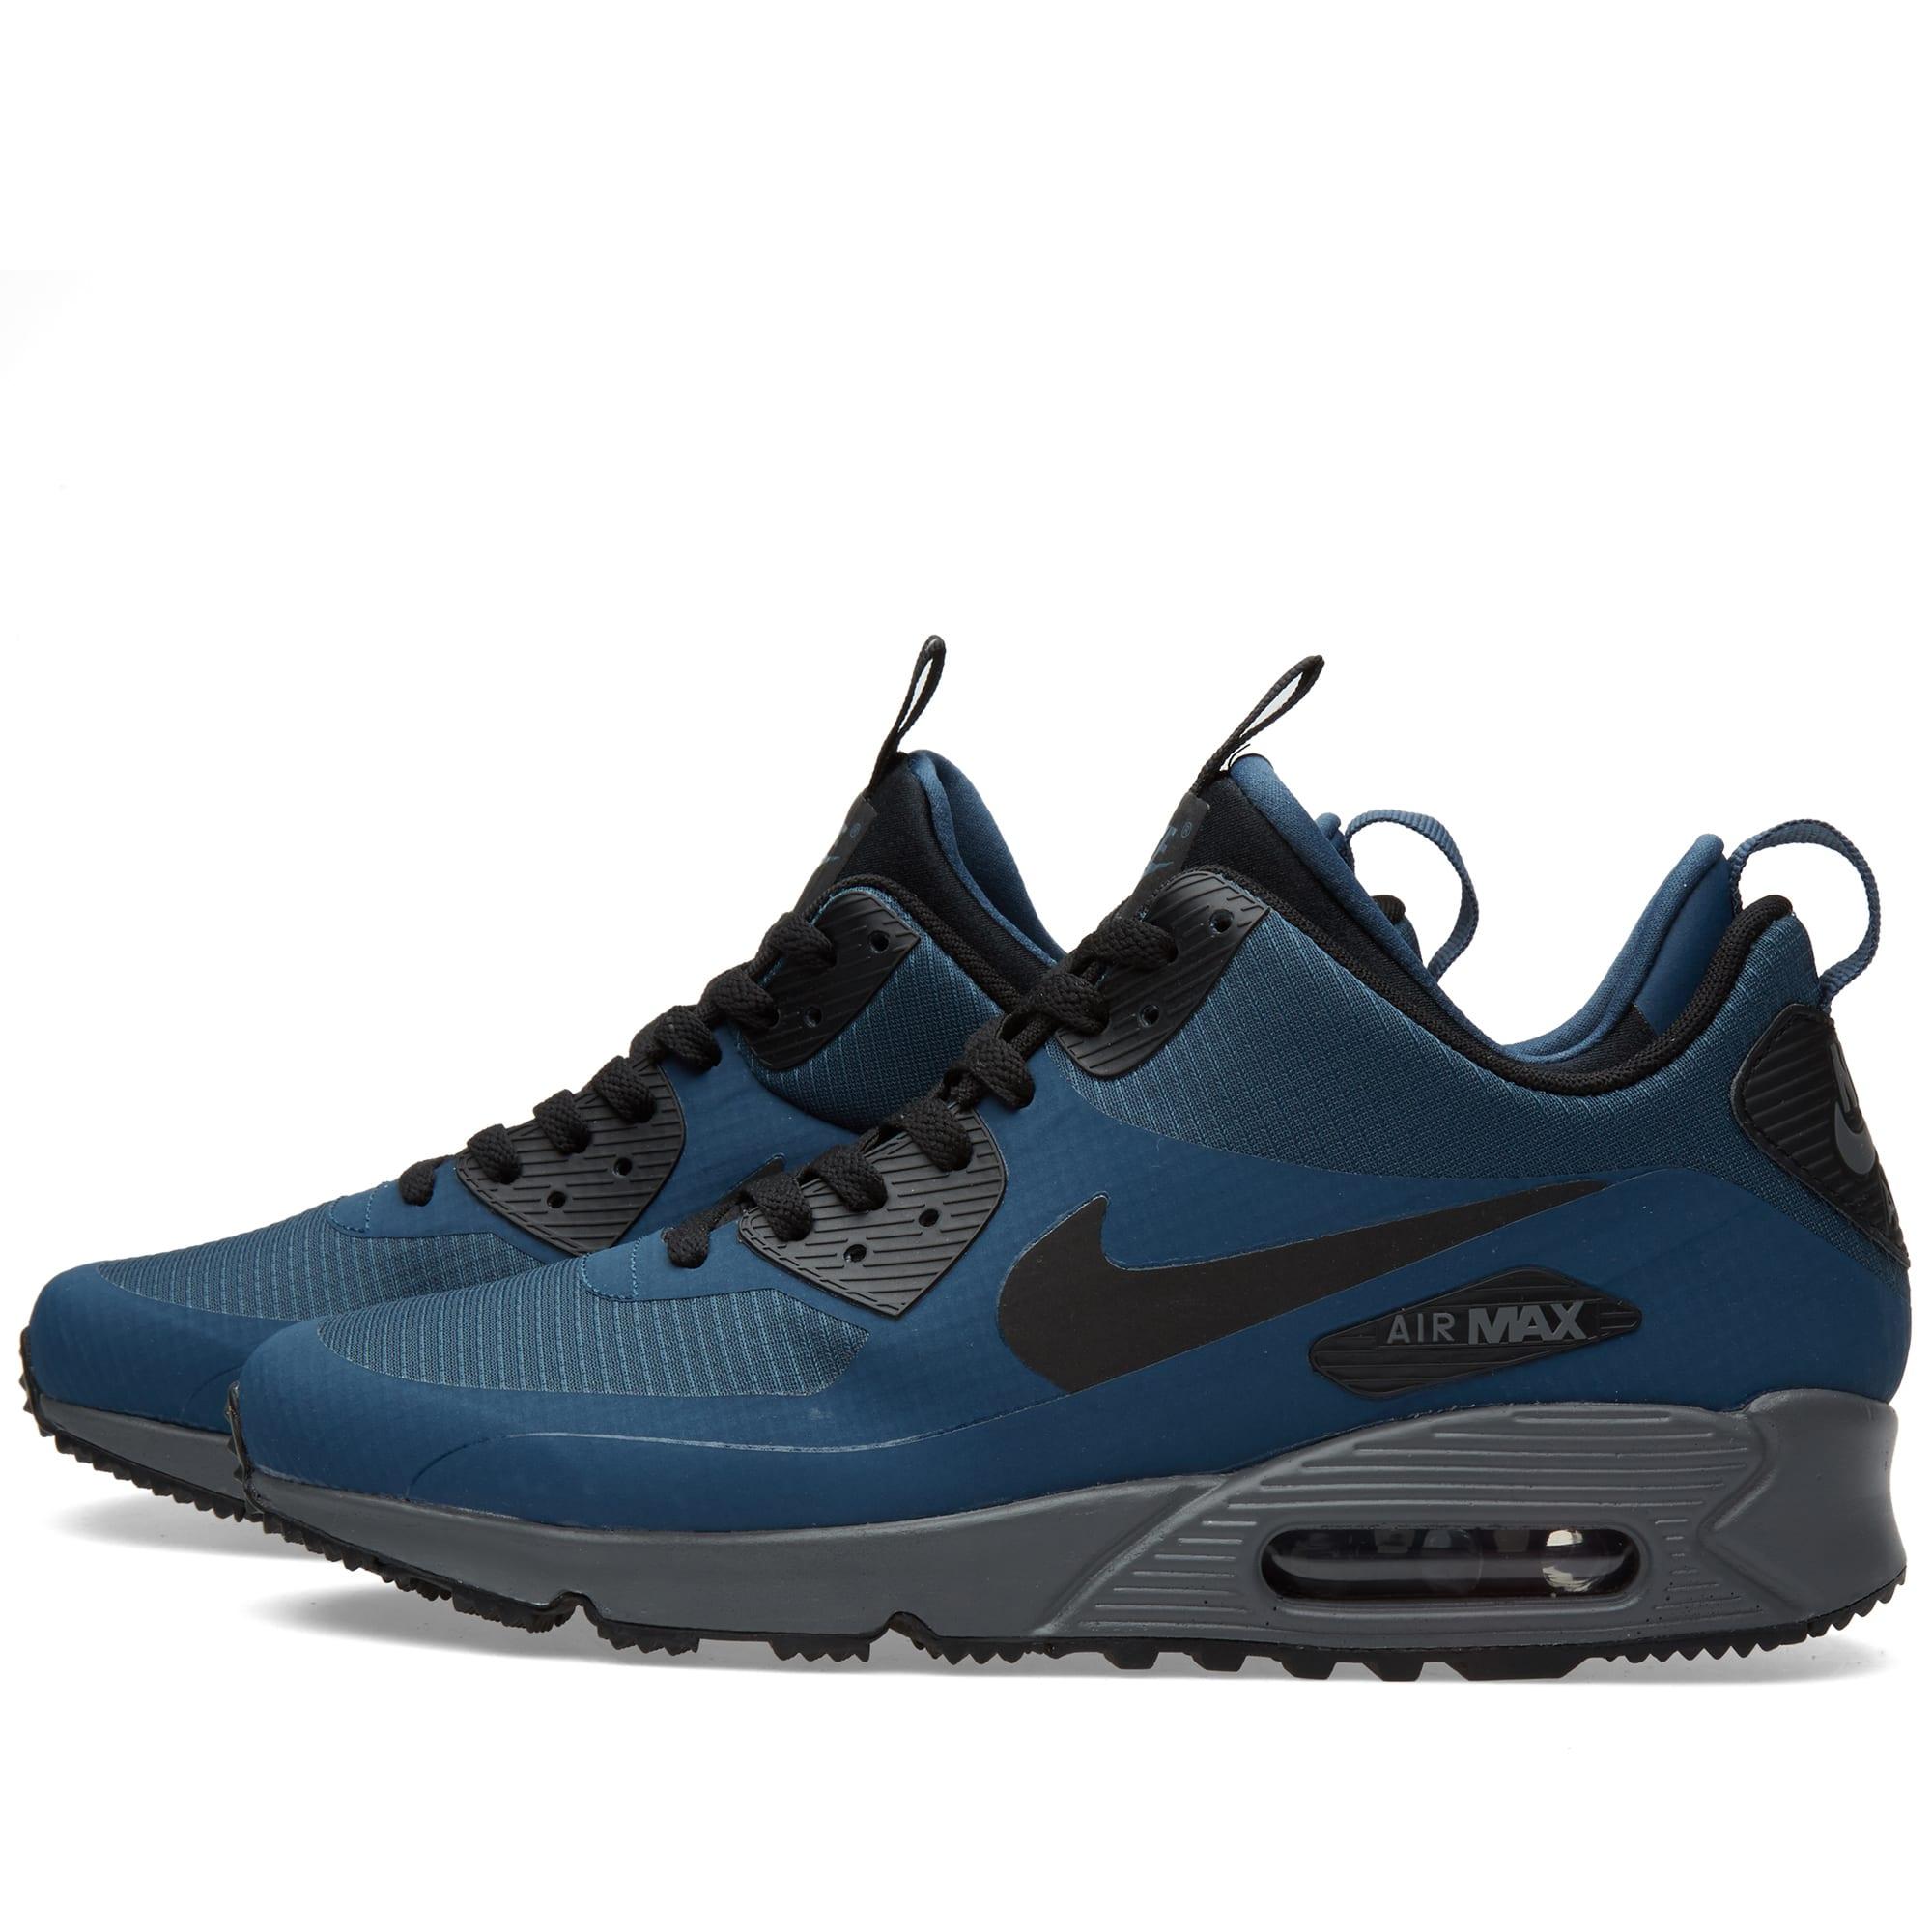 reputable site fd54d 0bef0 Nike Air Max 90 Mid Winter Squadron Blue   Black   END.